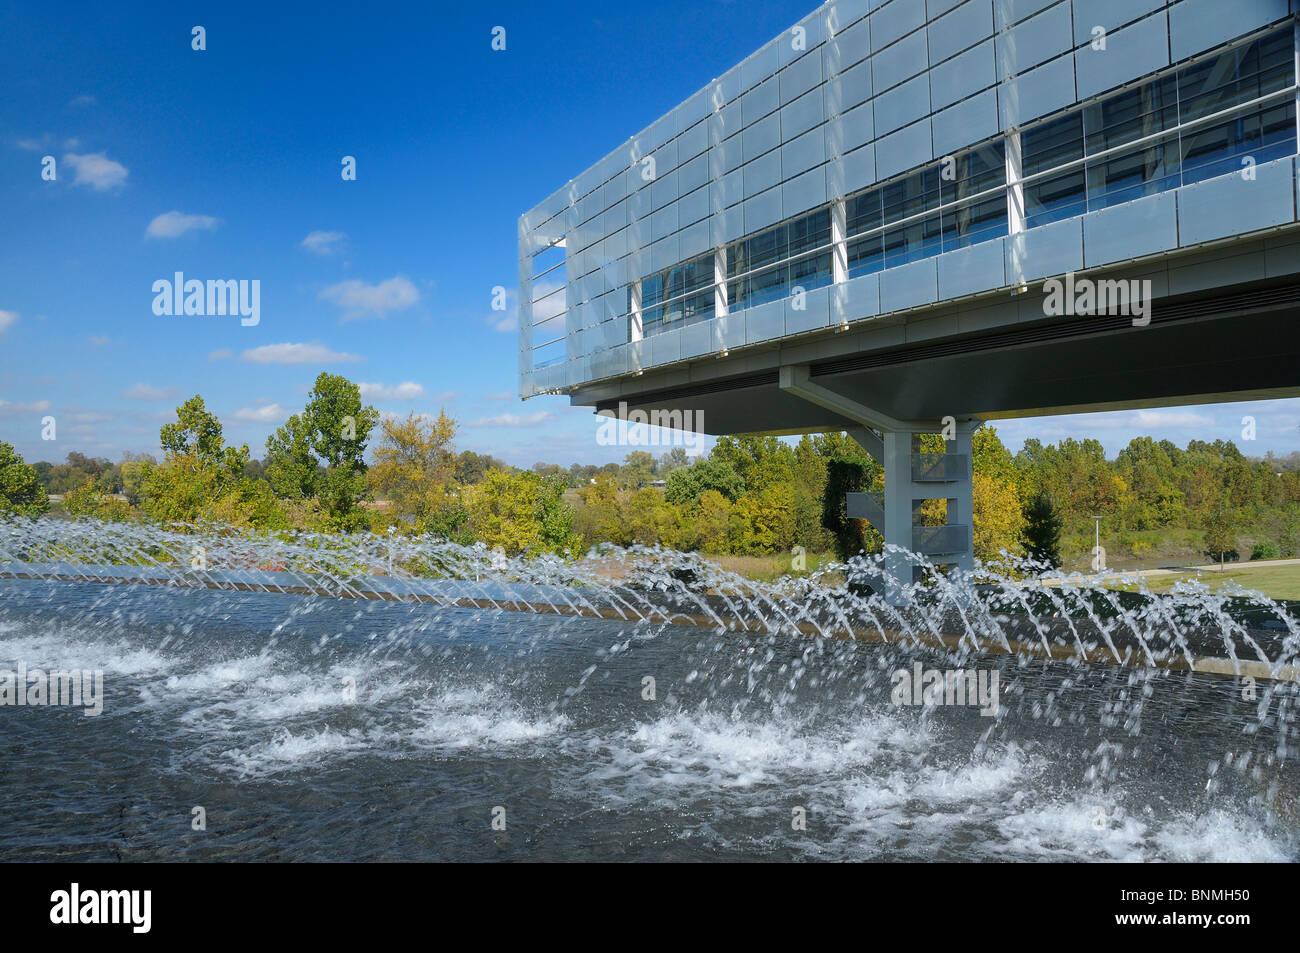 William J. Clinton Presidential Center & Park Library Exterior Little Rock Arkansas USA fountain park architecture - Stock Image